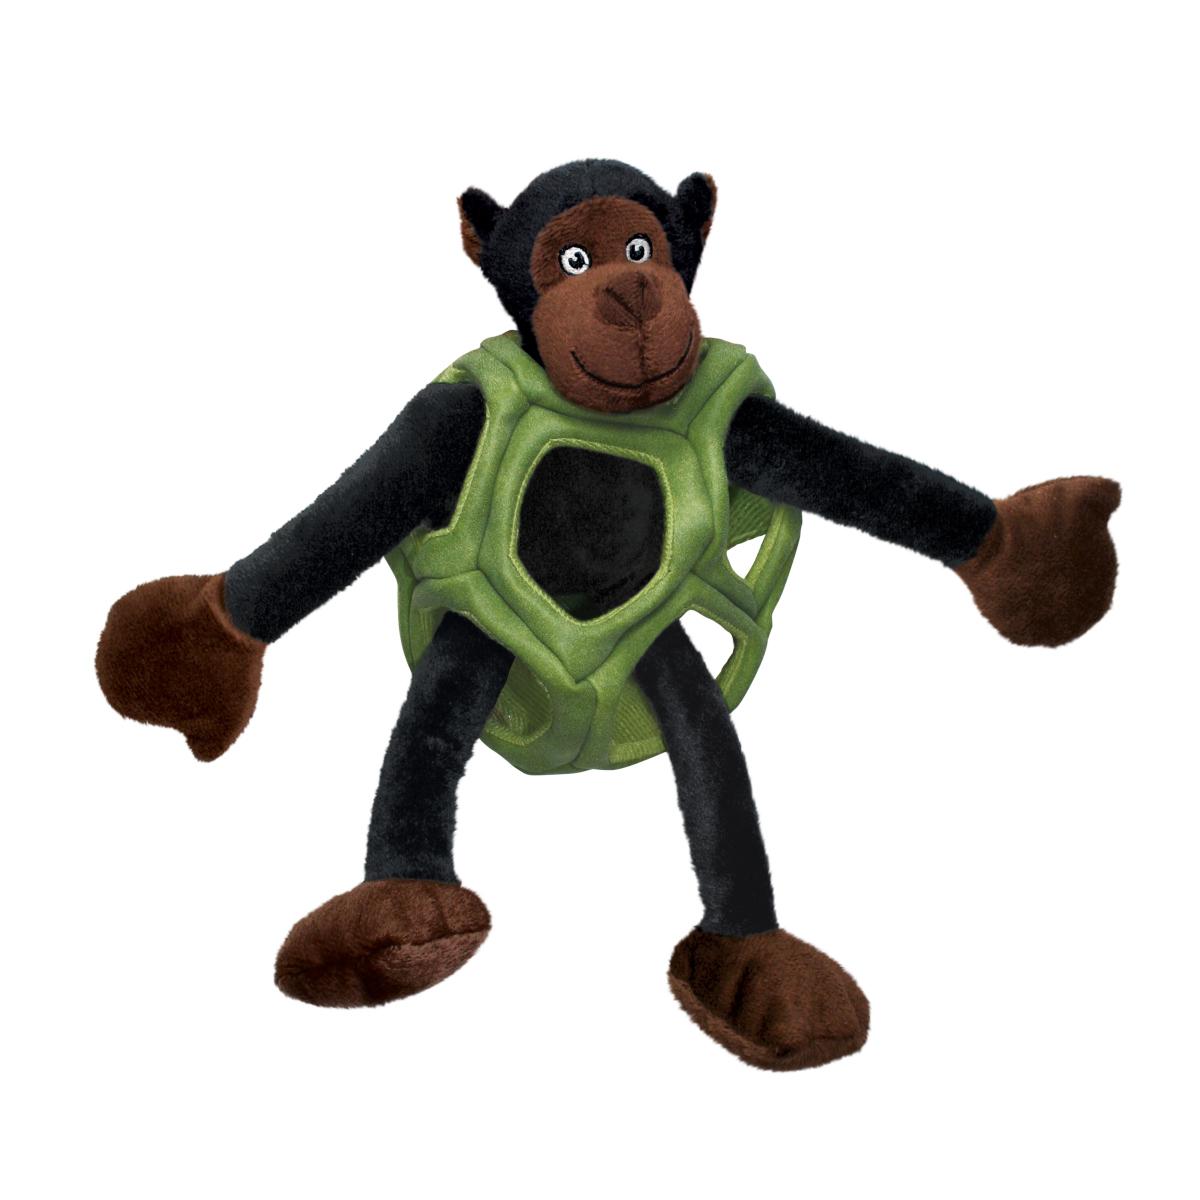 Puzzlement monkey zwart/groen